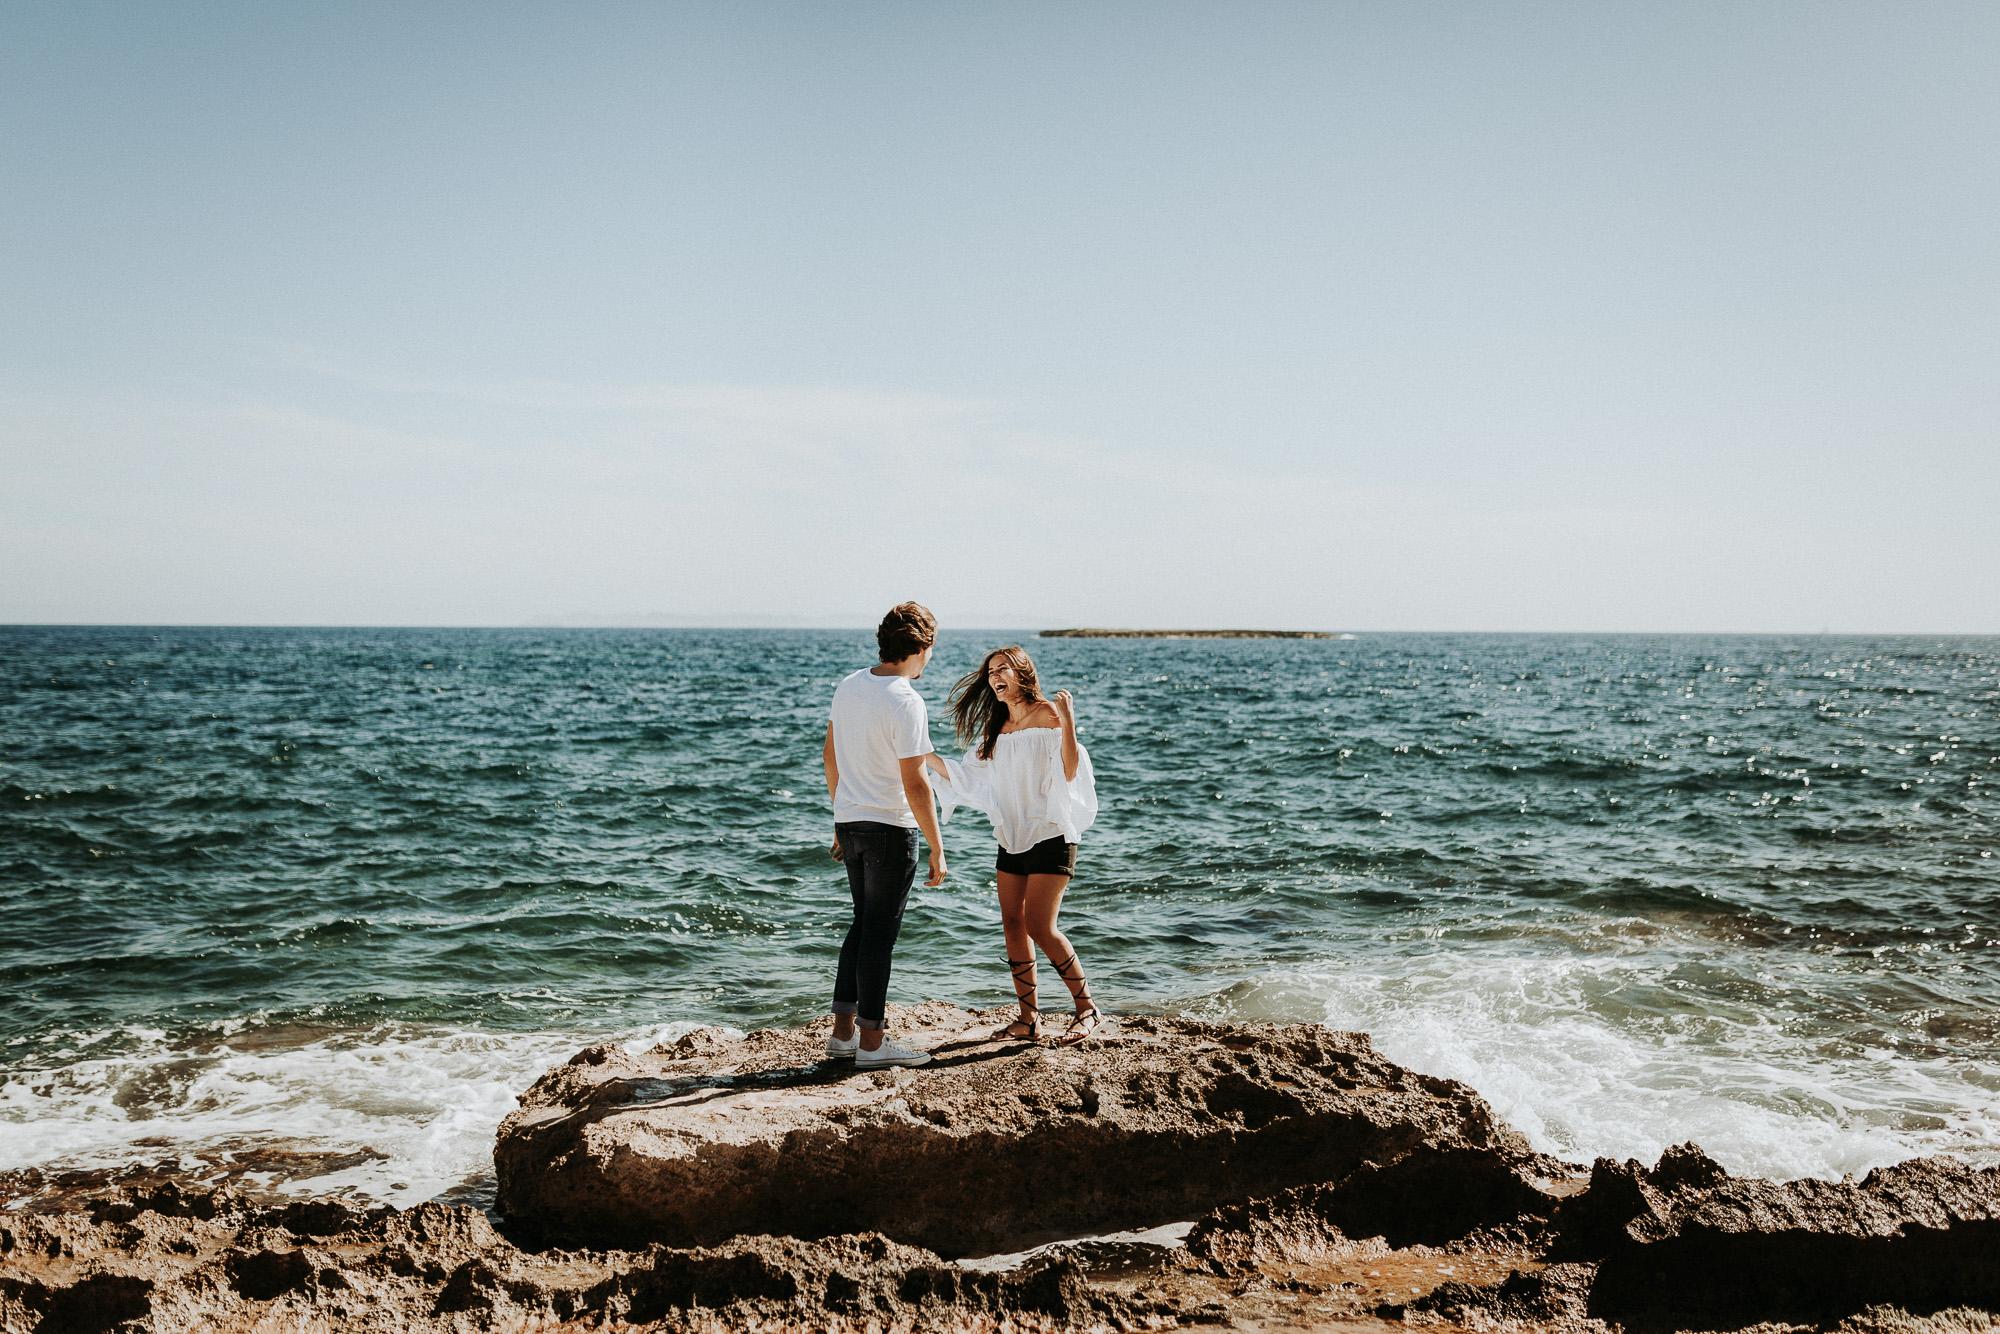 DanielaMarquardtPhotography_wedding_elopement_mallorca_spain_stjordi_sessalines_marinaandxavi154